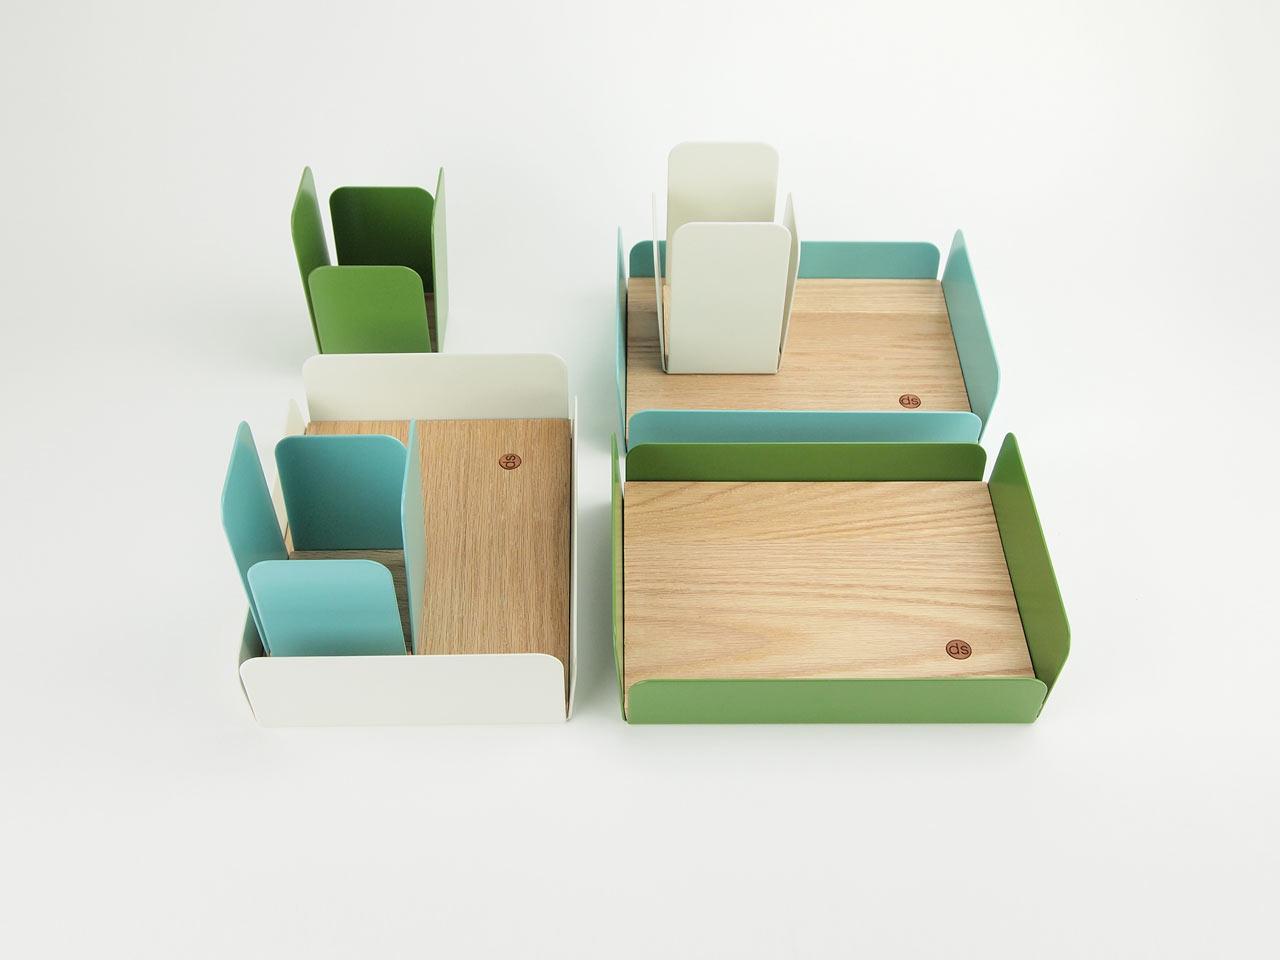 Petals Desk Accessories By Dino Sanchez Design Milk